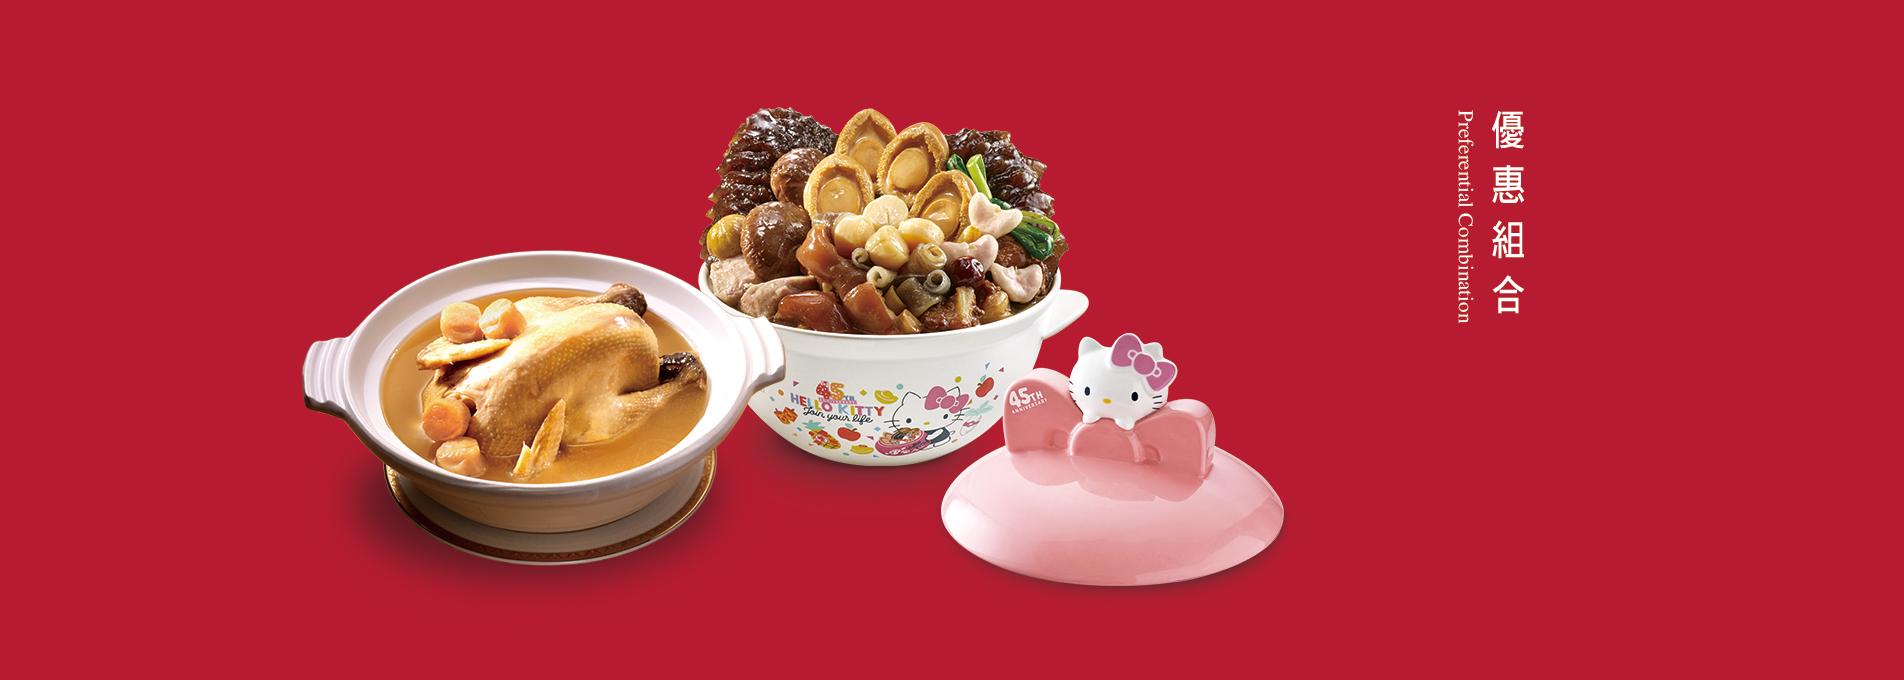 Hello Kitty 45週年佛跳牆(附限量蝴蝶結造型陶瓷砂鍋) +干貝熬雞湯(無附砂鍋)